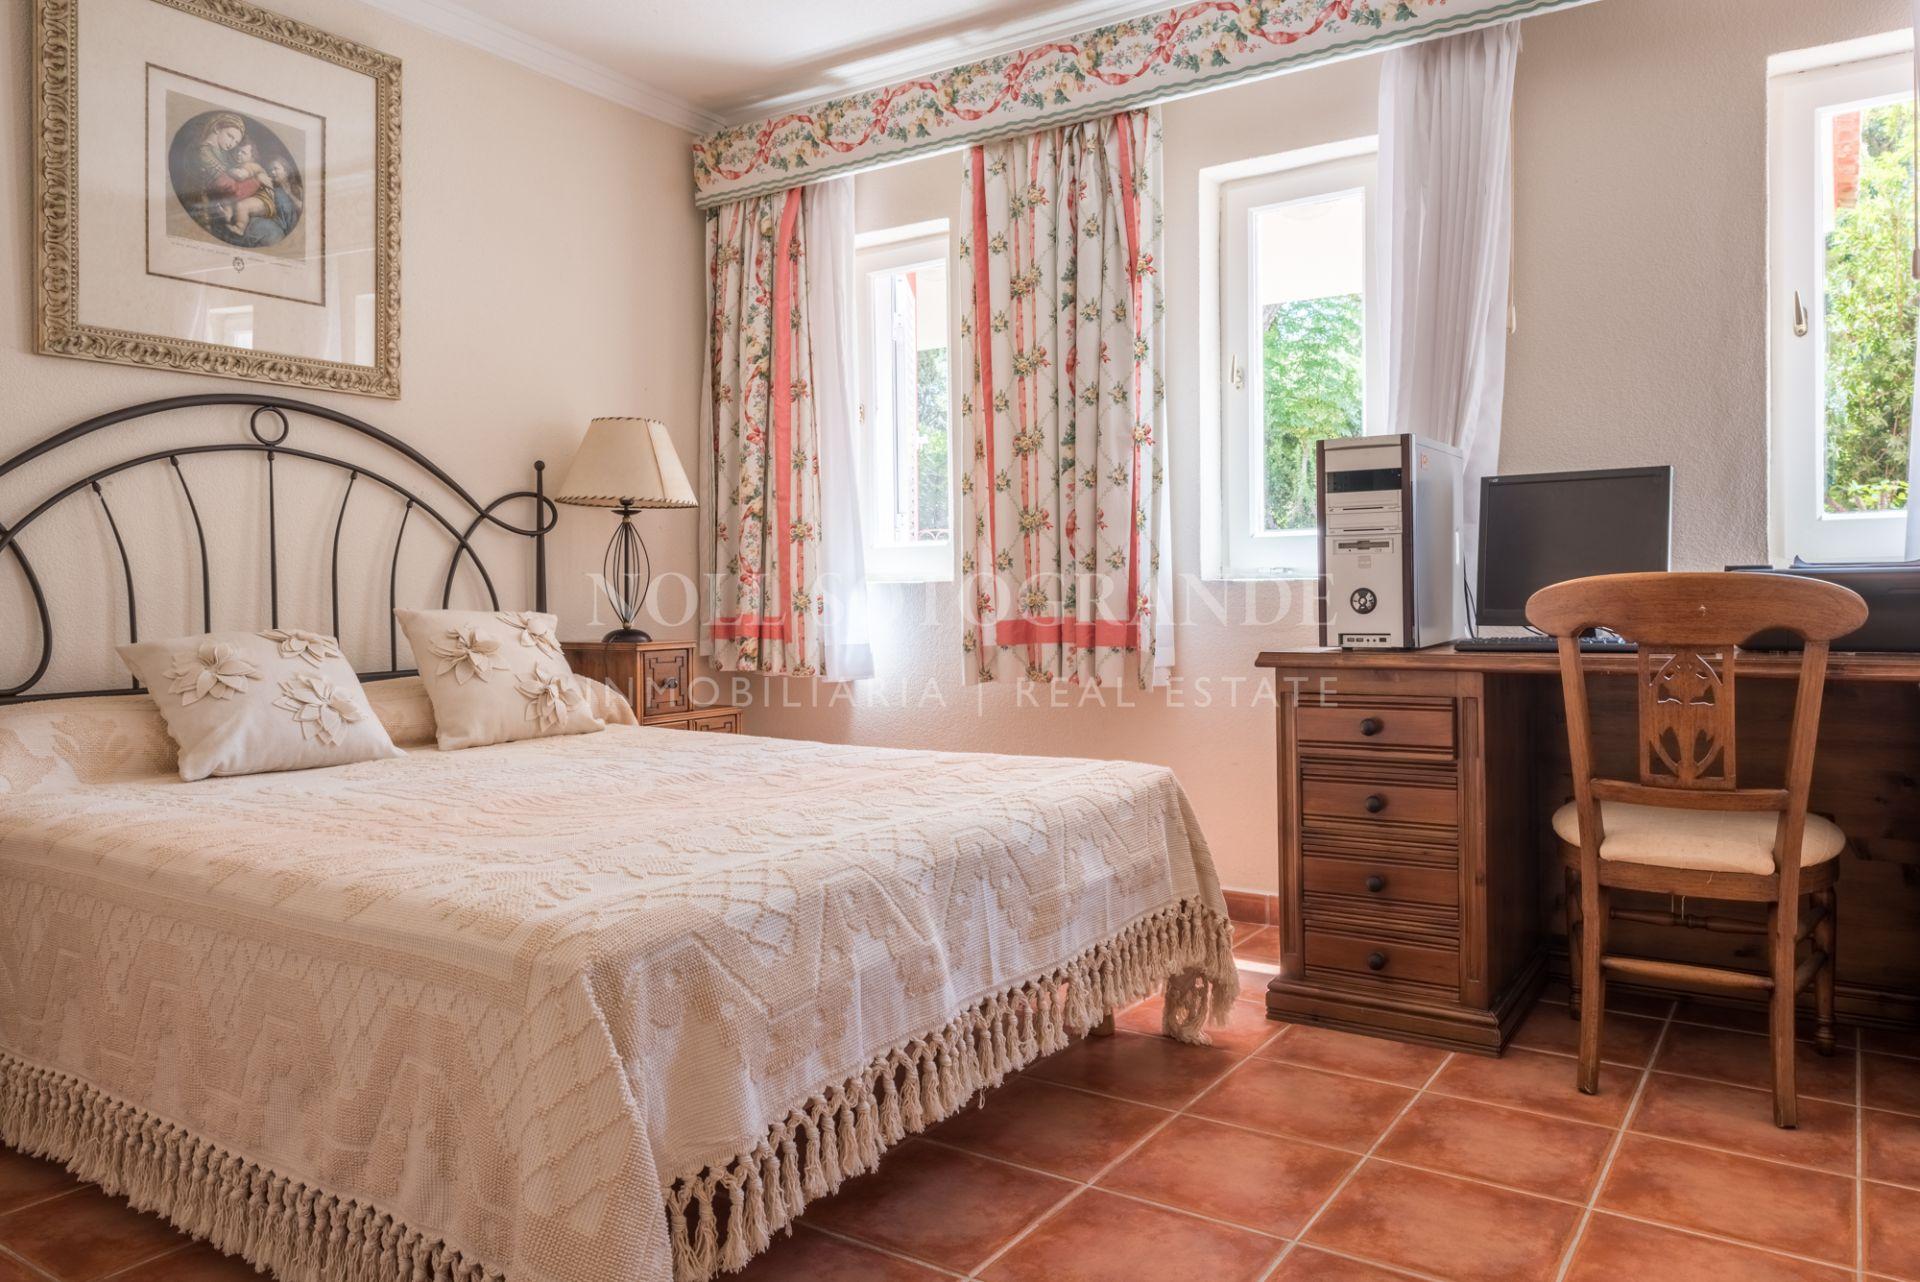 Villa for sale on large plot Sotogrande Costa